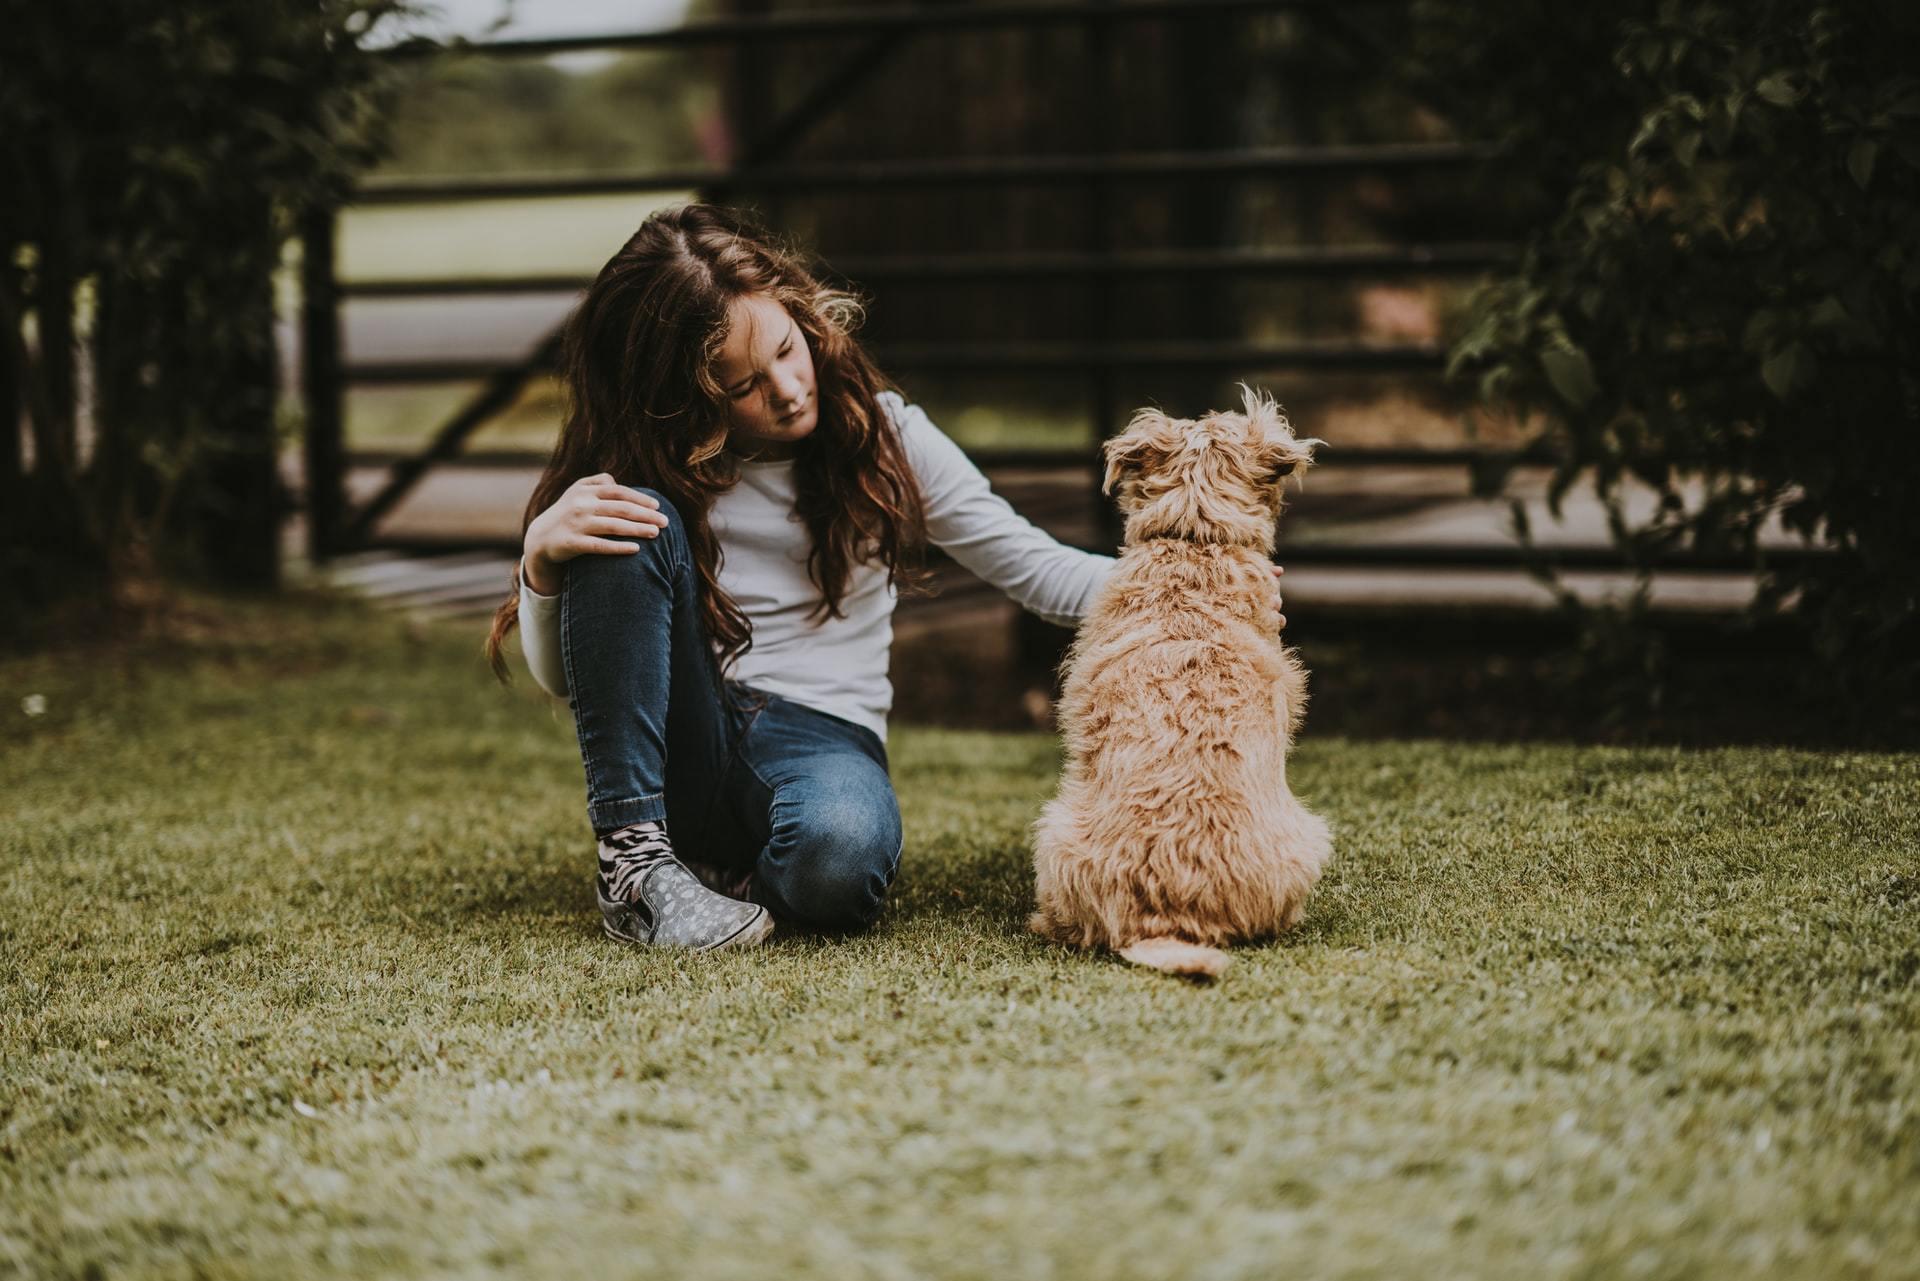 pepto-bismol for dogs